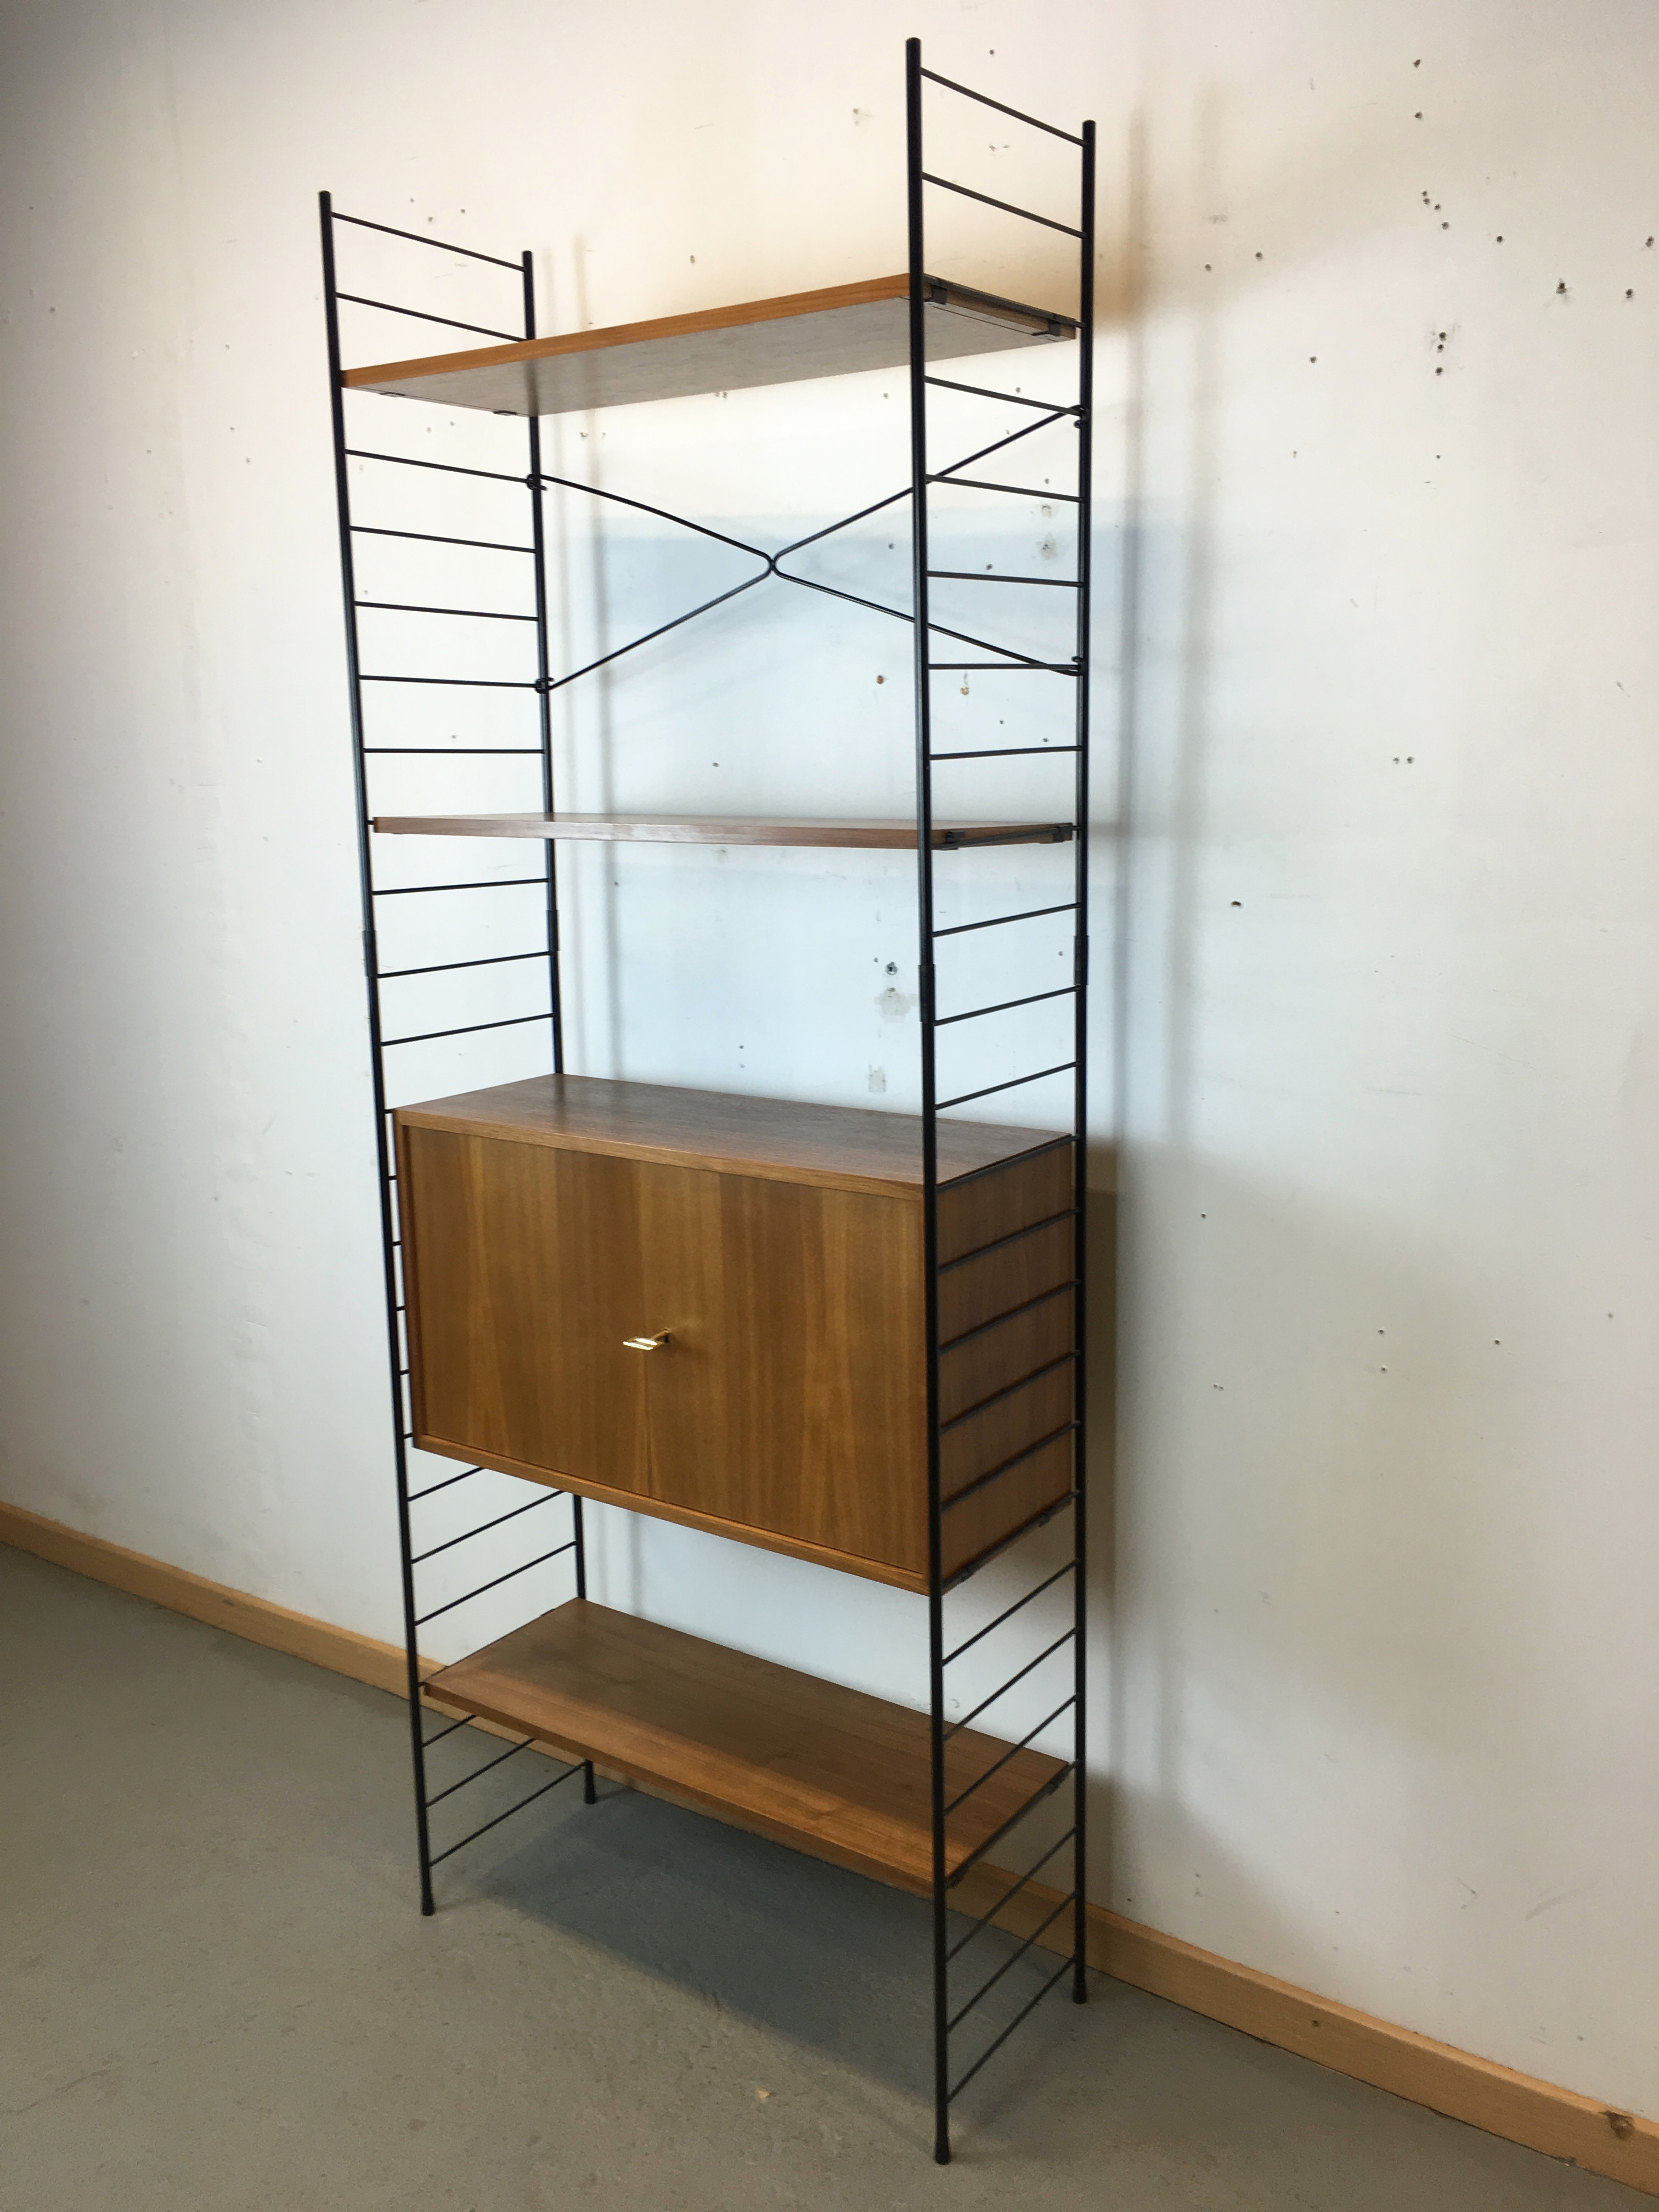 etag res biblioth que modulable string regal ann e 60. Black Bedroom Furniture Sets. Home Design Ideas